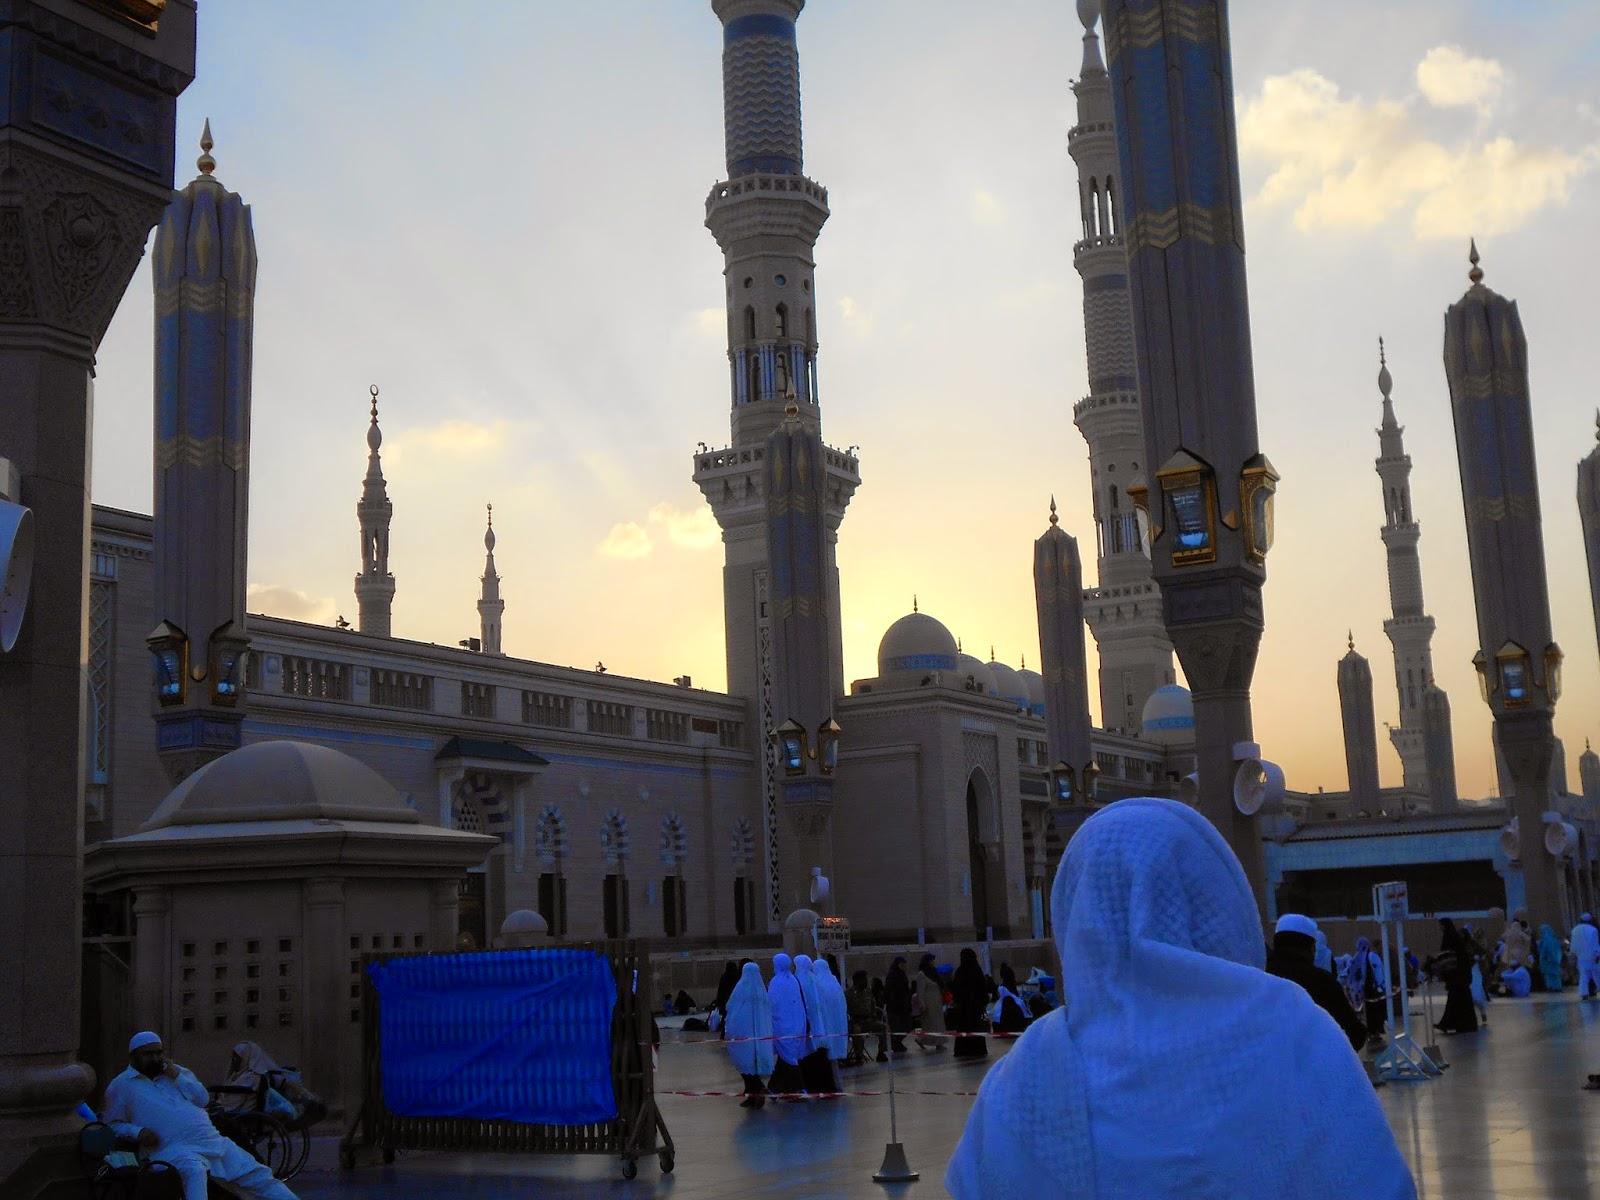 Pengalaman mendebarkan di Masjid Nabawi Madinah